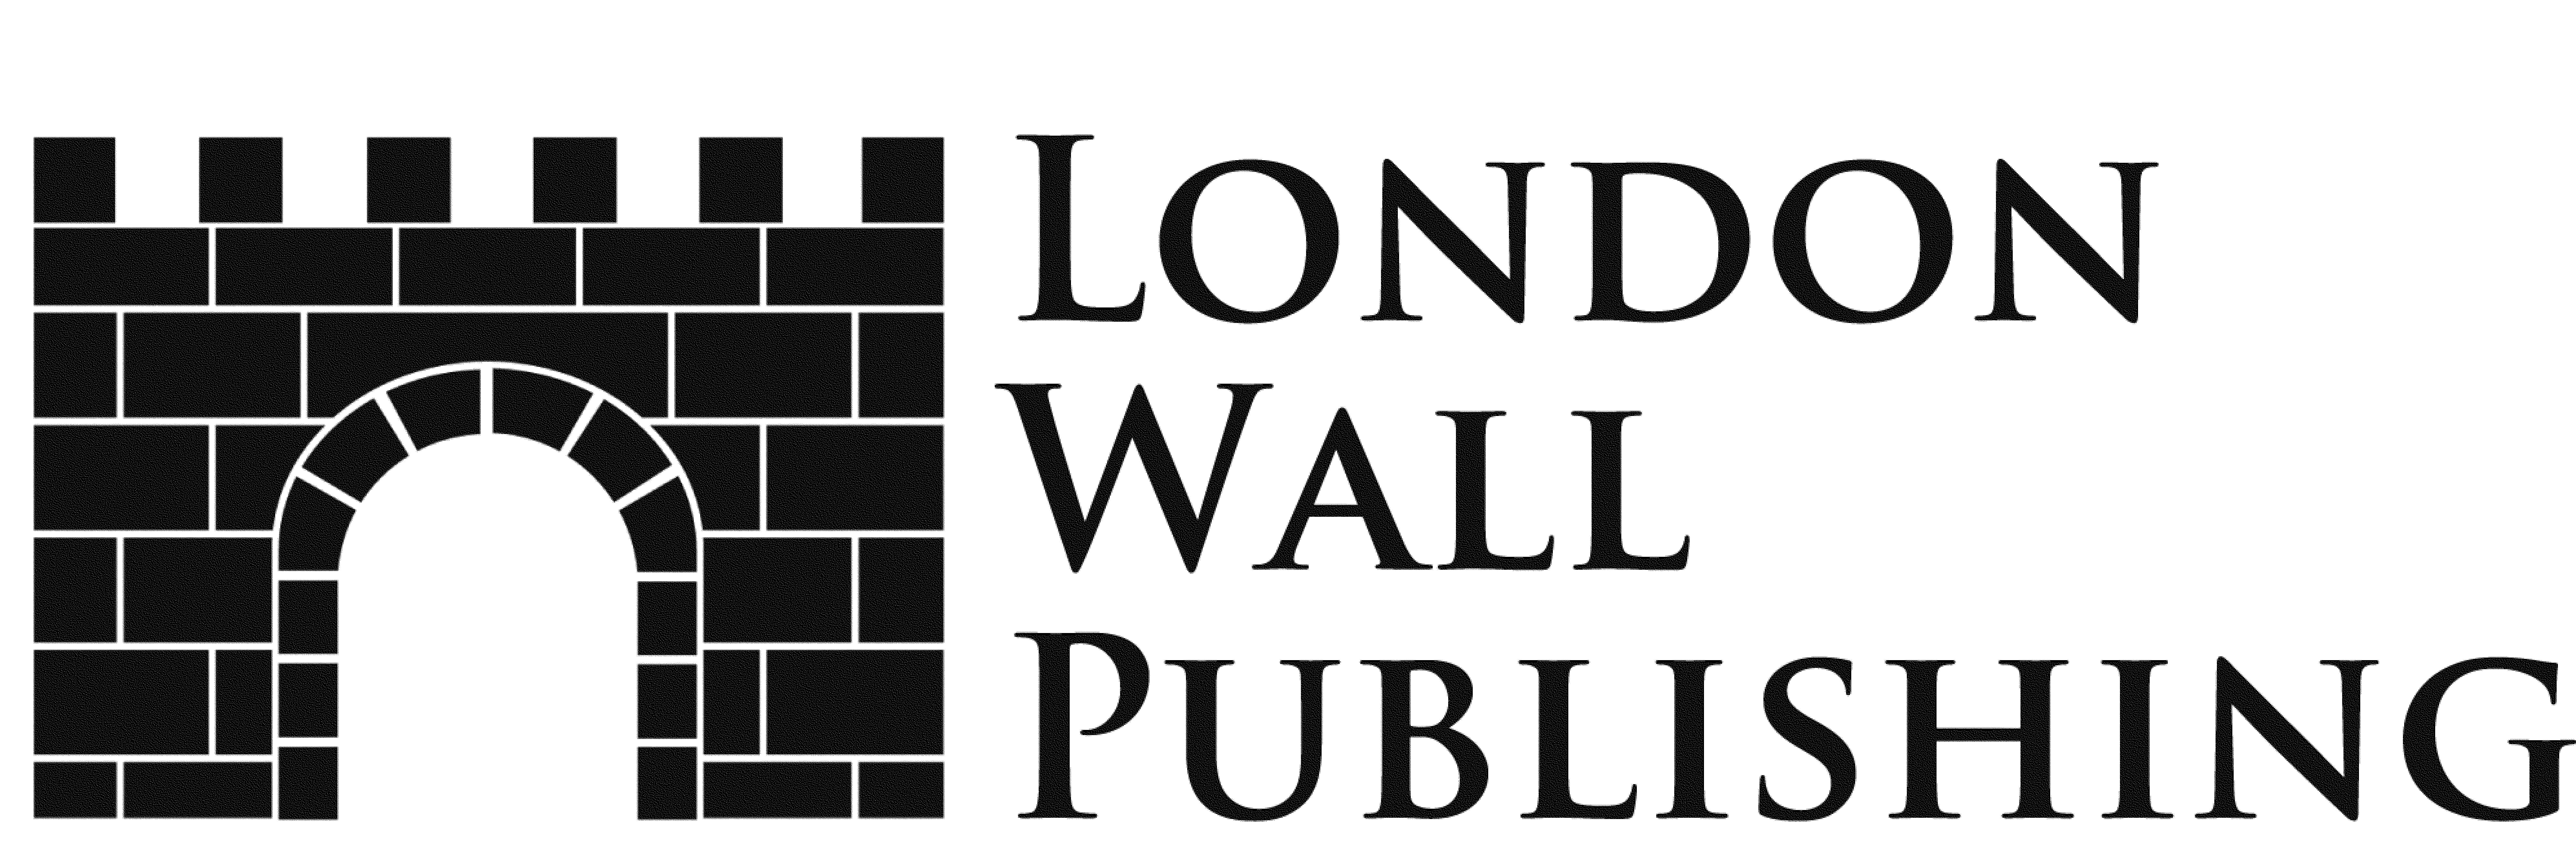 London Wall Publishing